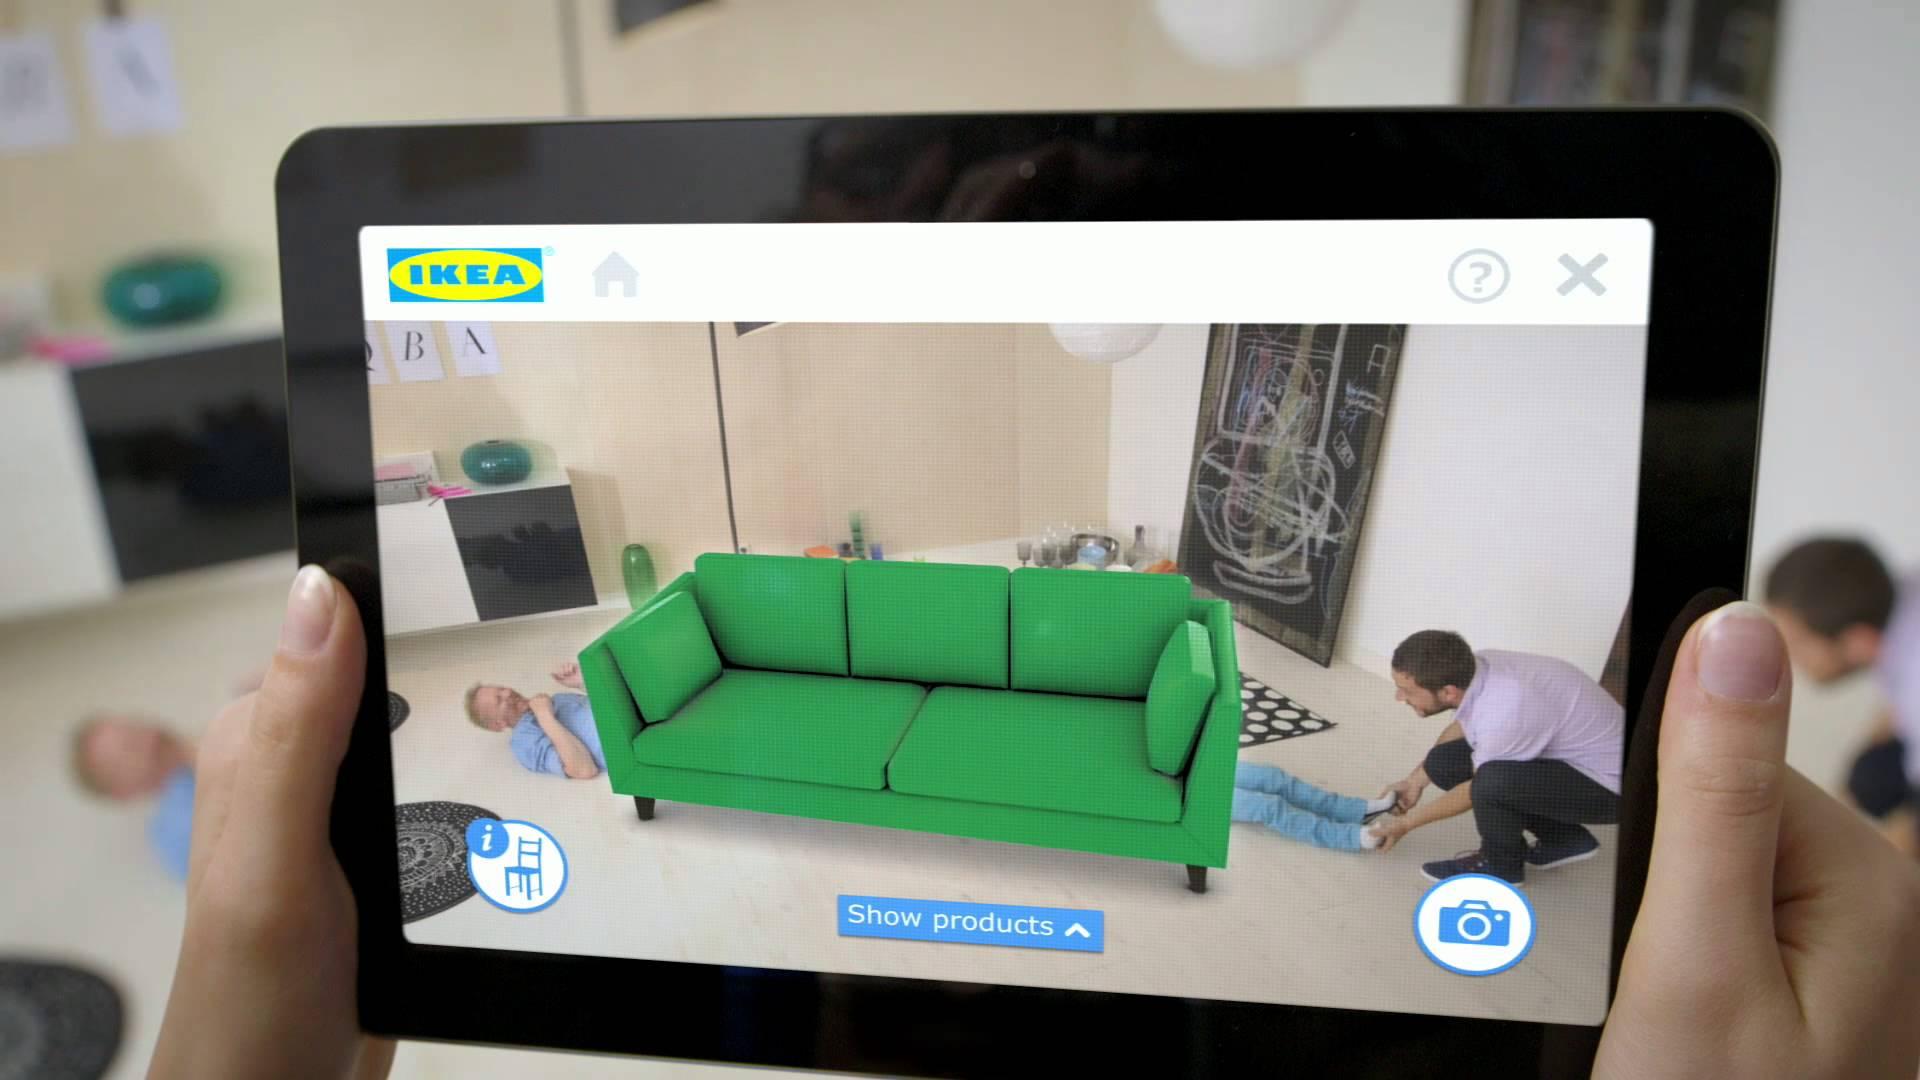 ikea app - Ikea lanza aplicación que permite amueblar espacios virtualmente